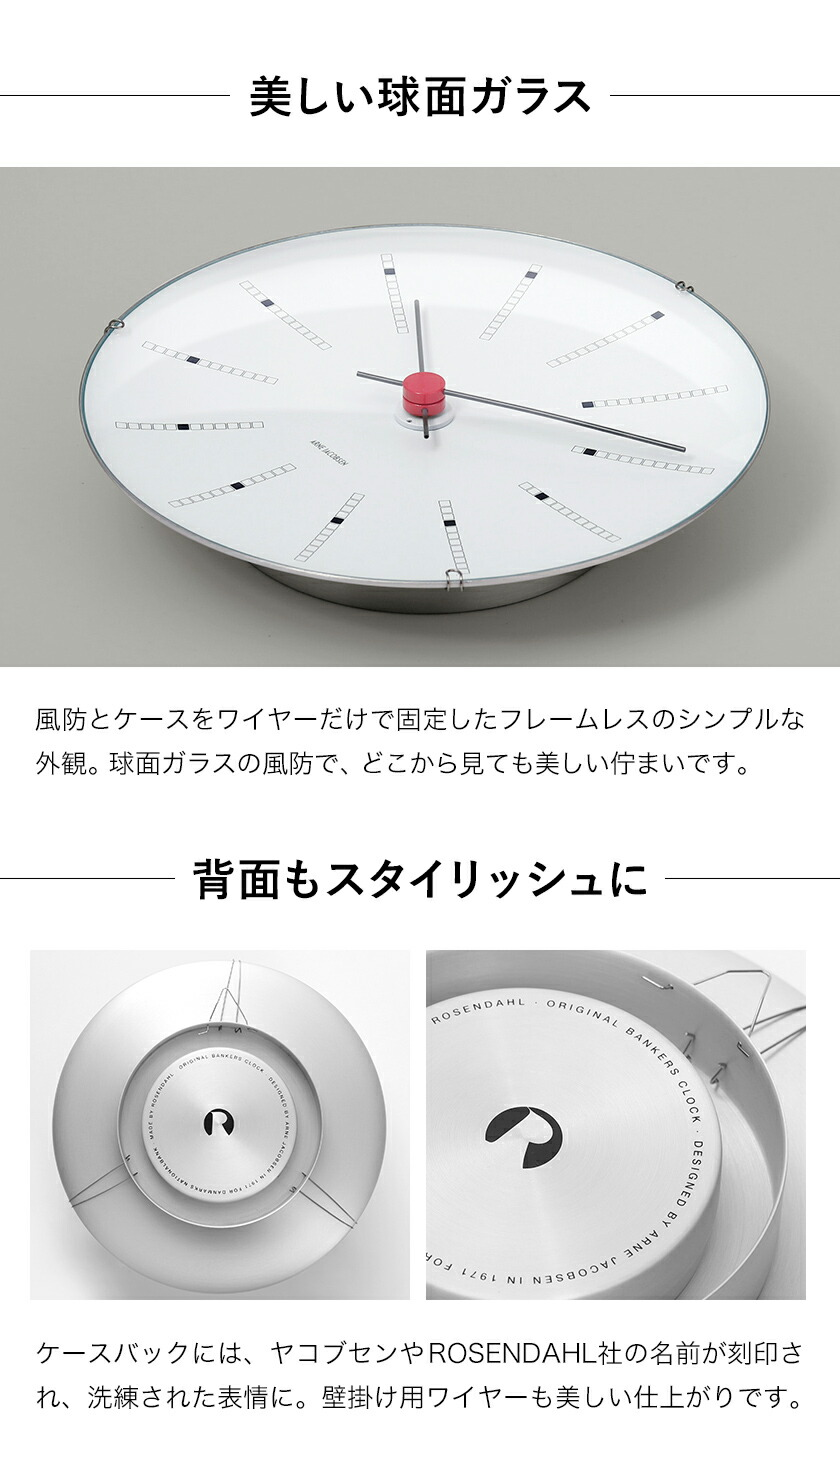 ARNE JACOBSENのバンカーズの掛け時計